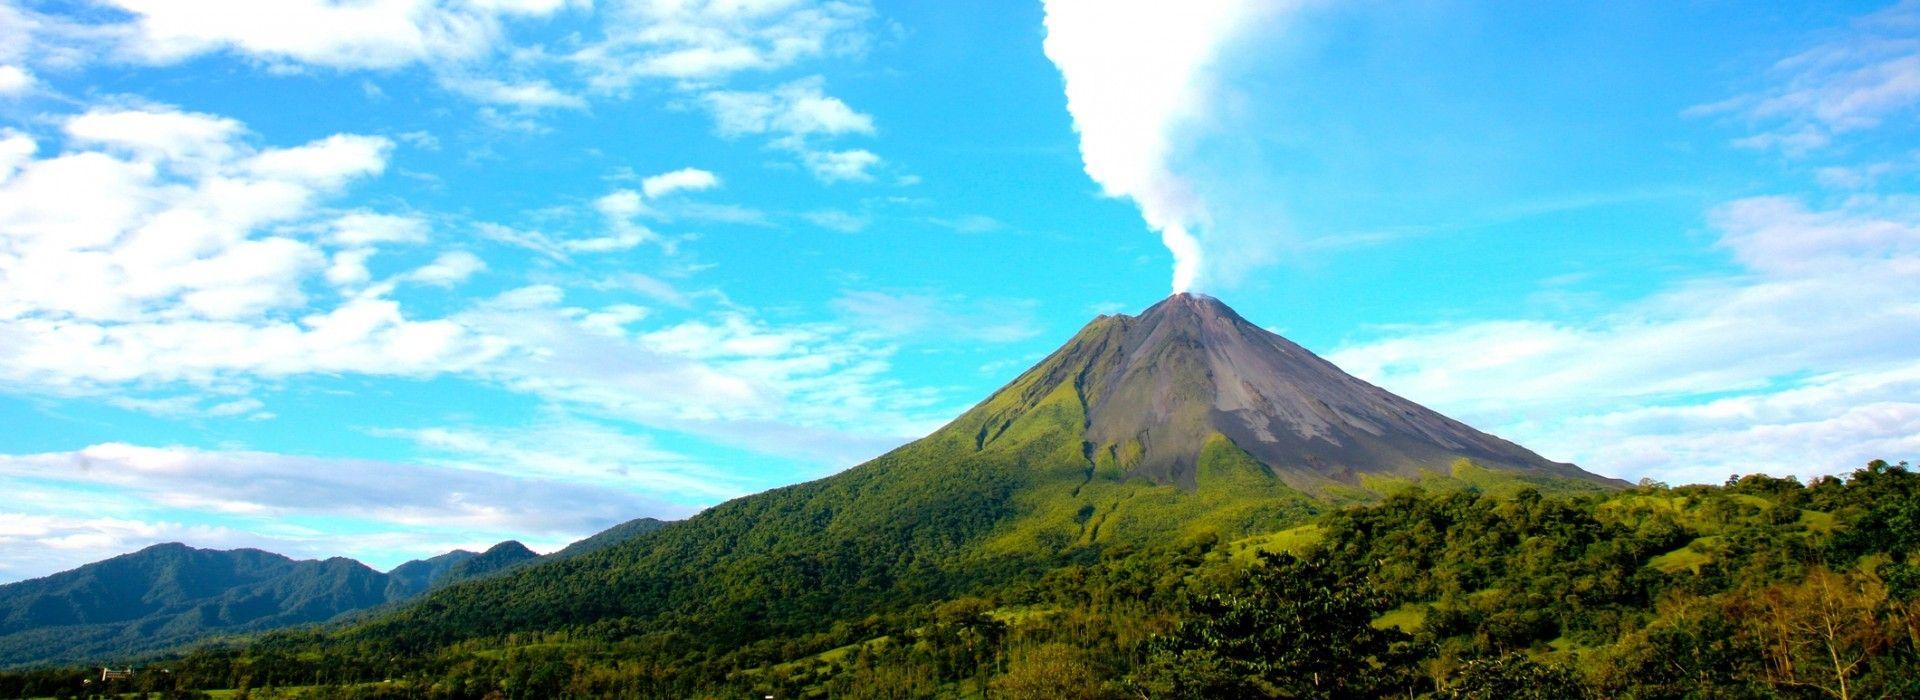 Walking tours in Costa Rica